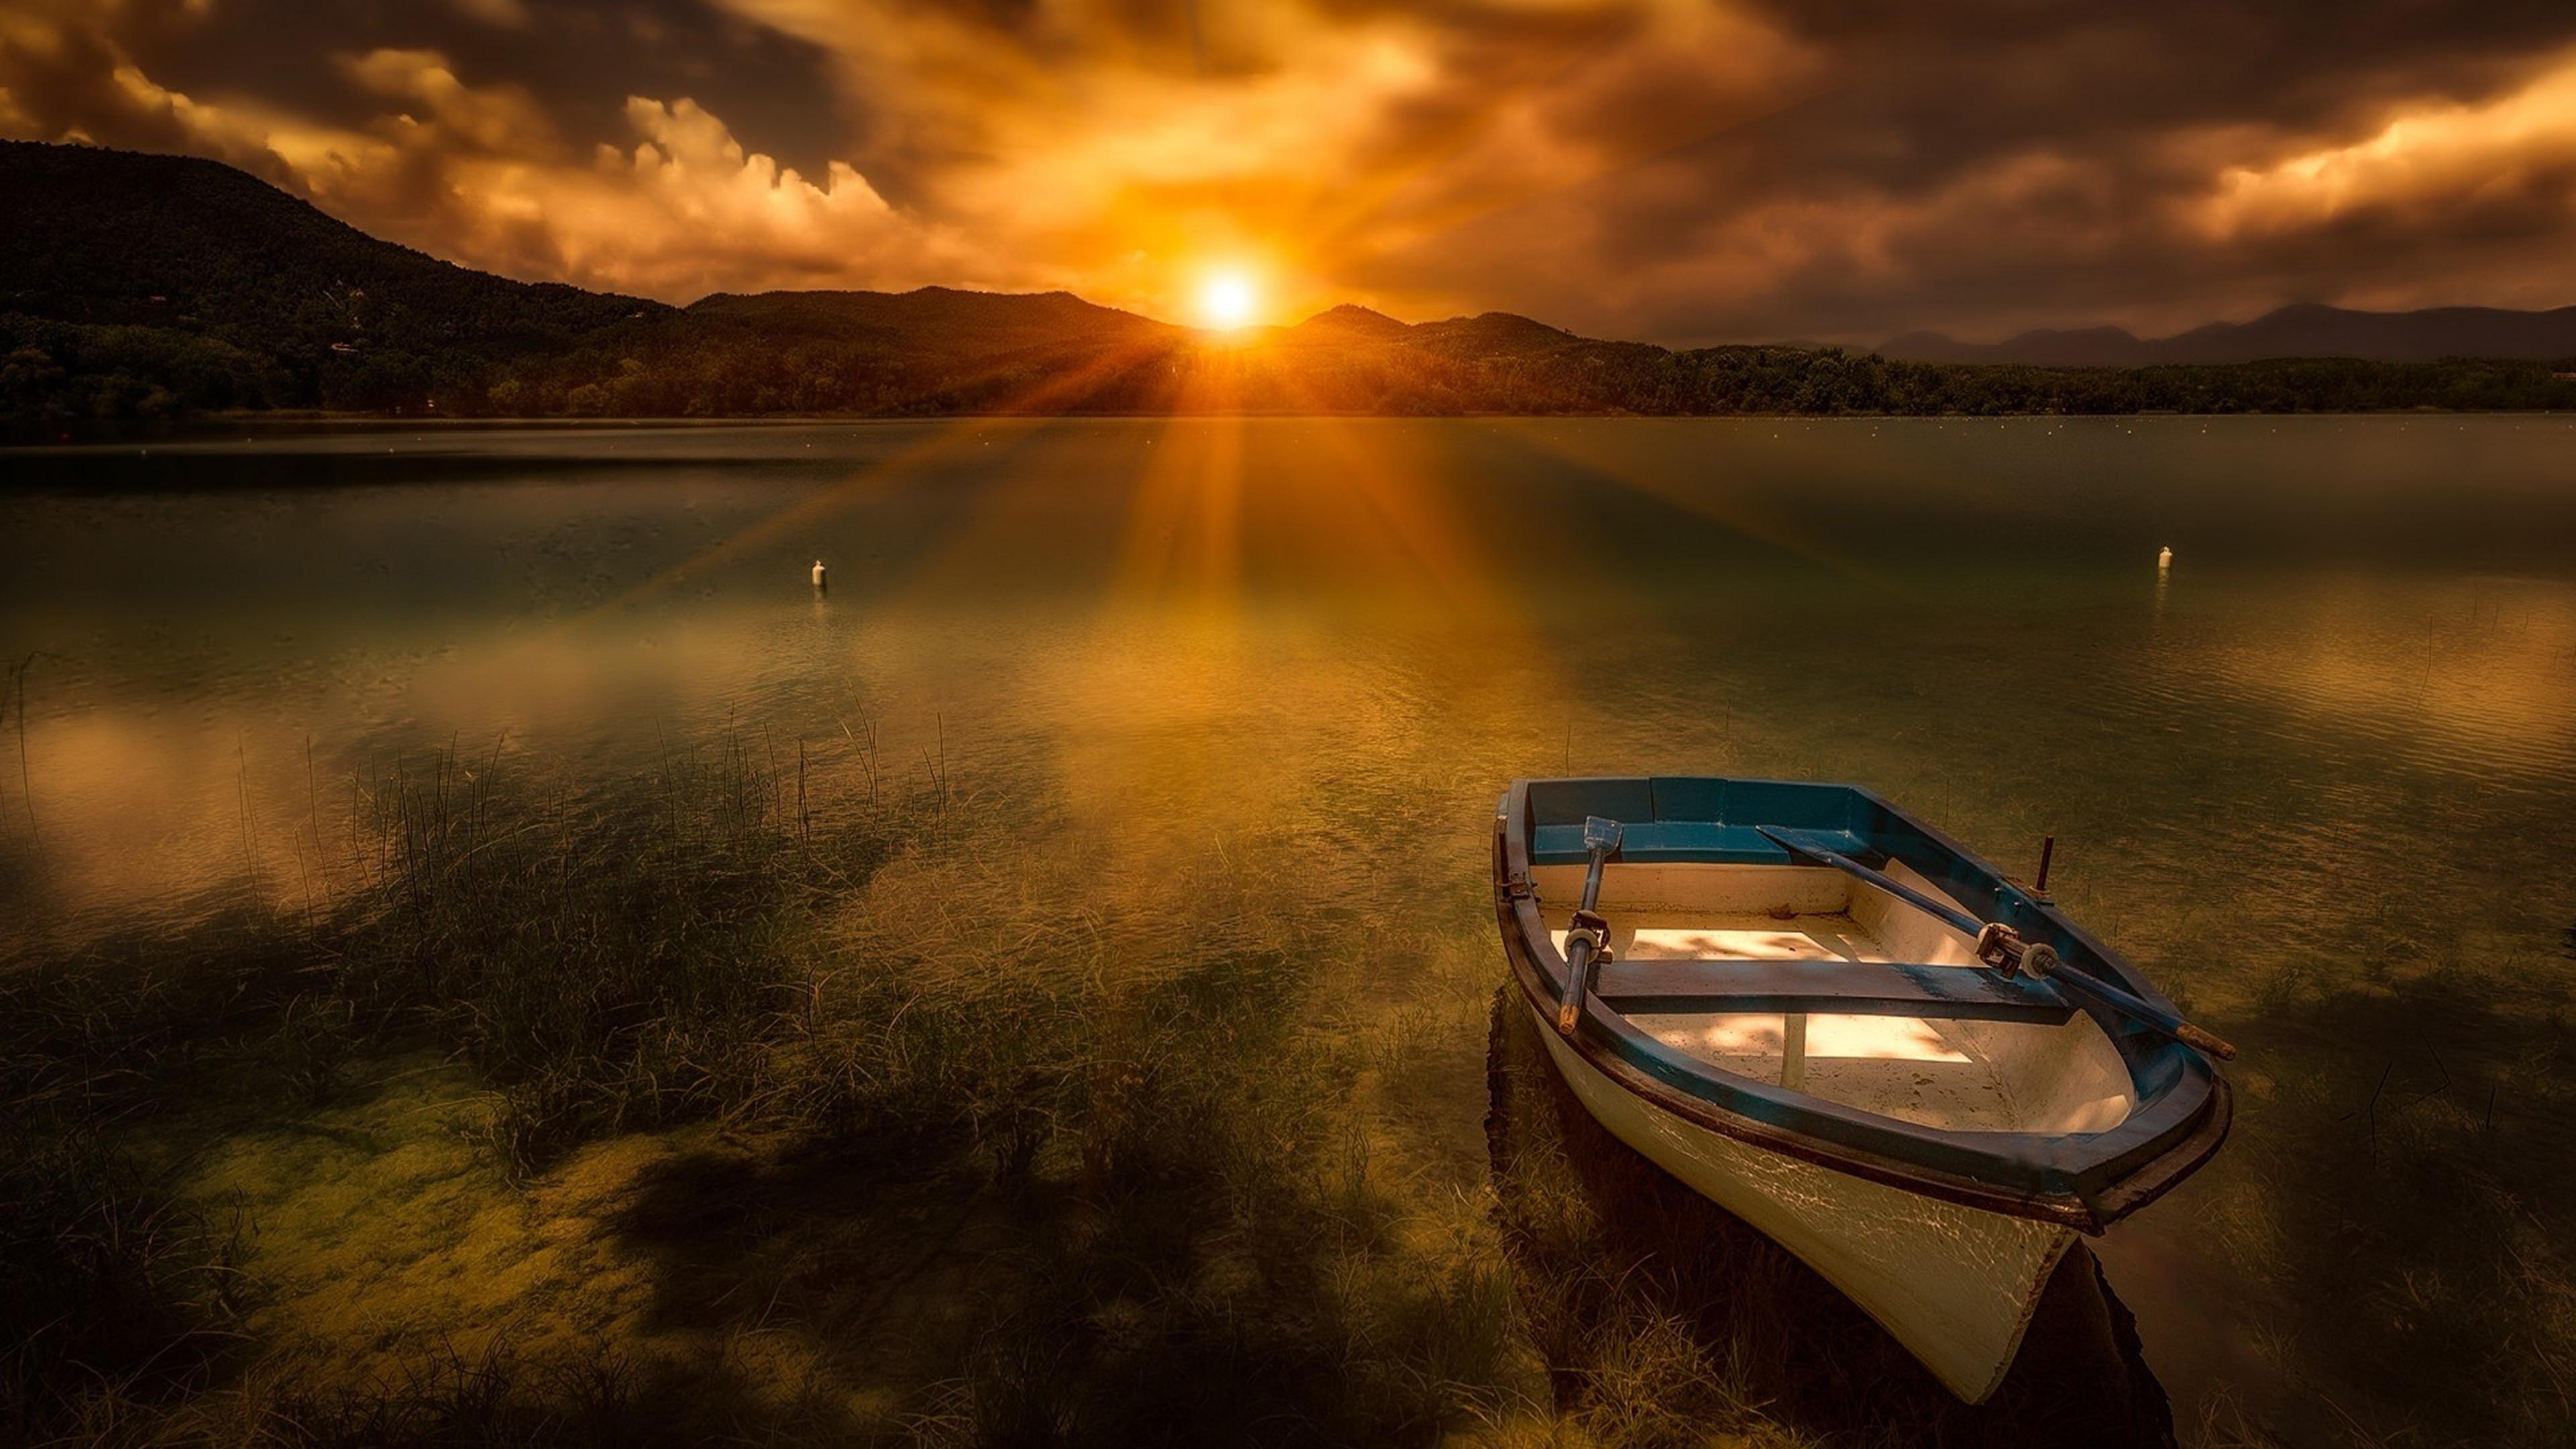 Canvas Hi Beautiful 3d Wallpaper Morning Sunrise Sun Lake Boat Evaporation Fog Hd Wallpaper